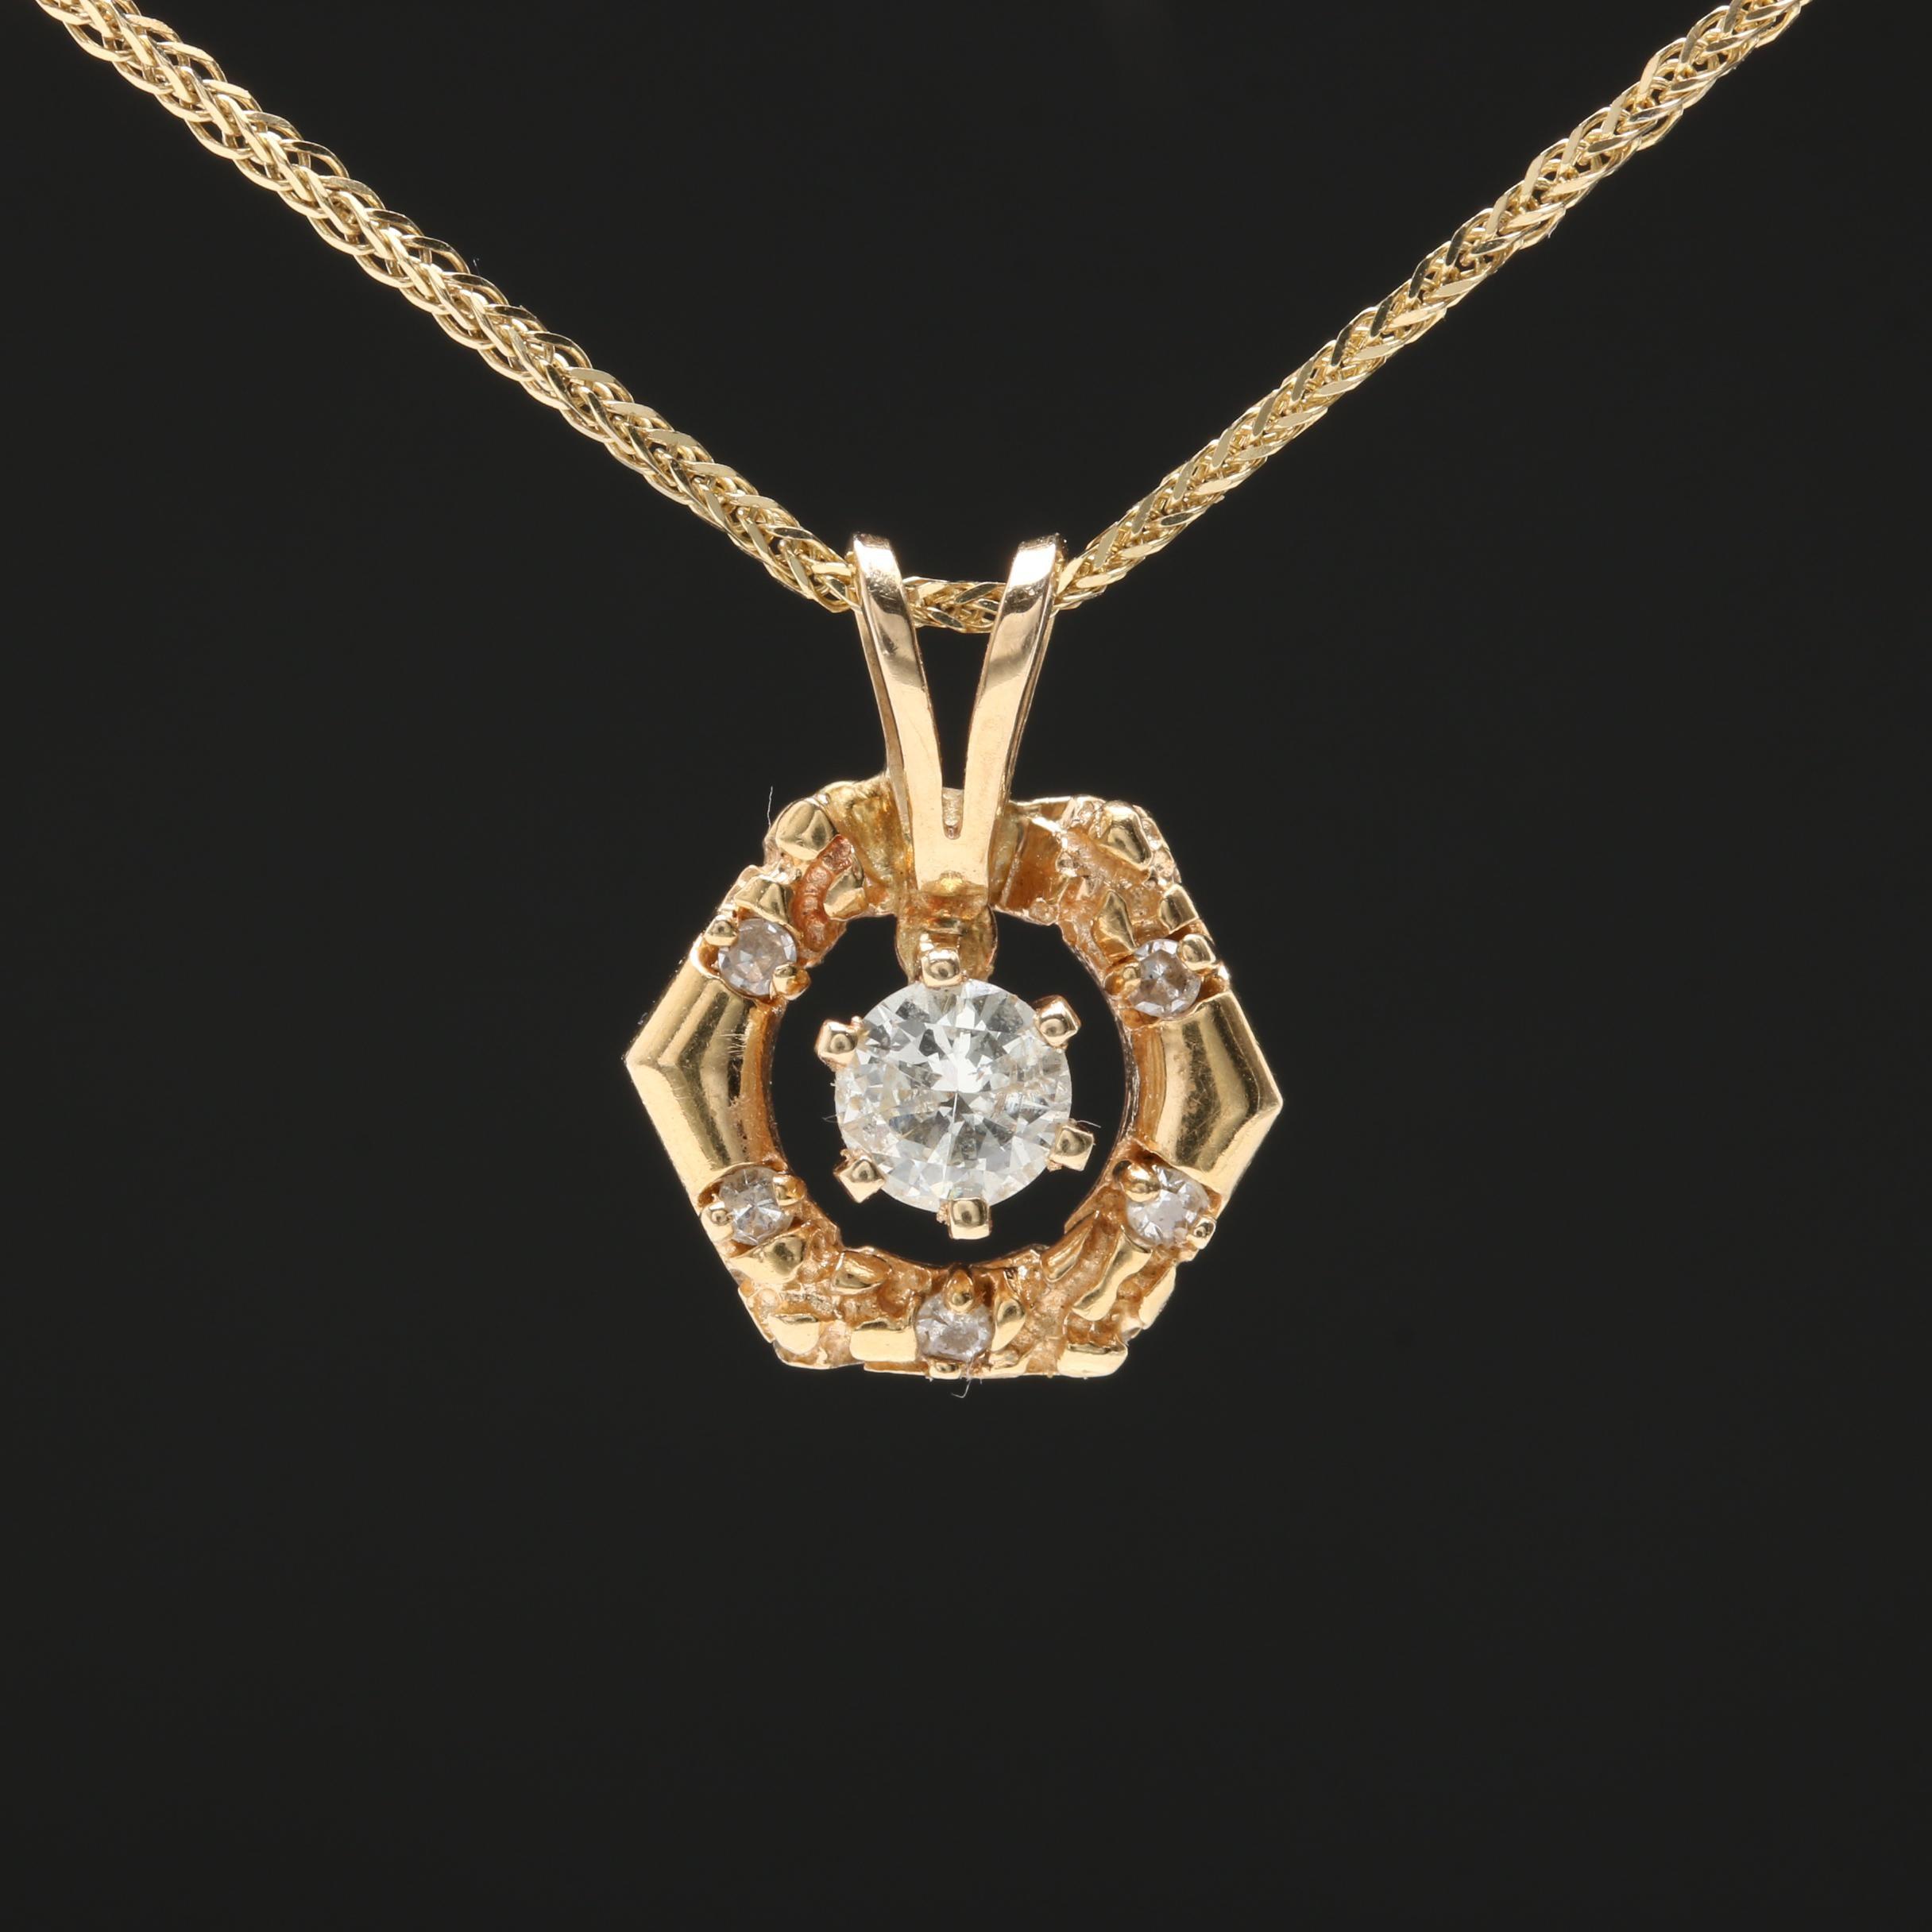 14K Yellow Gold Diamond Hexagon Pendant Necklace